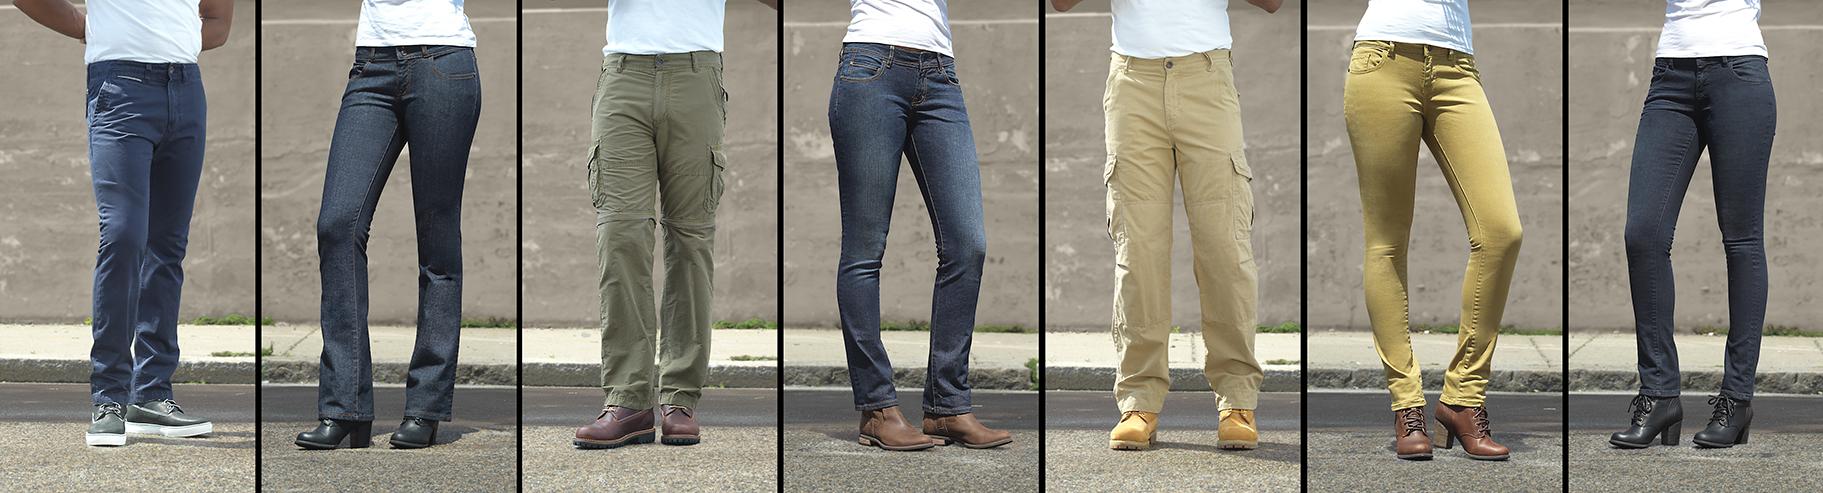 Timberland Company boot photo shoot - CommercialPhotography_Boston